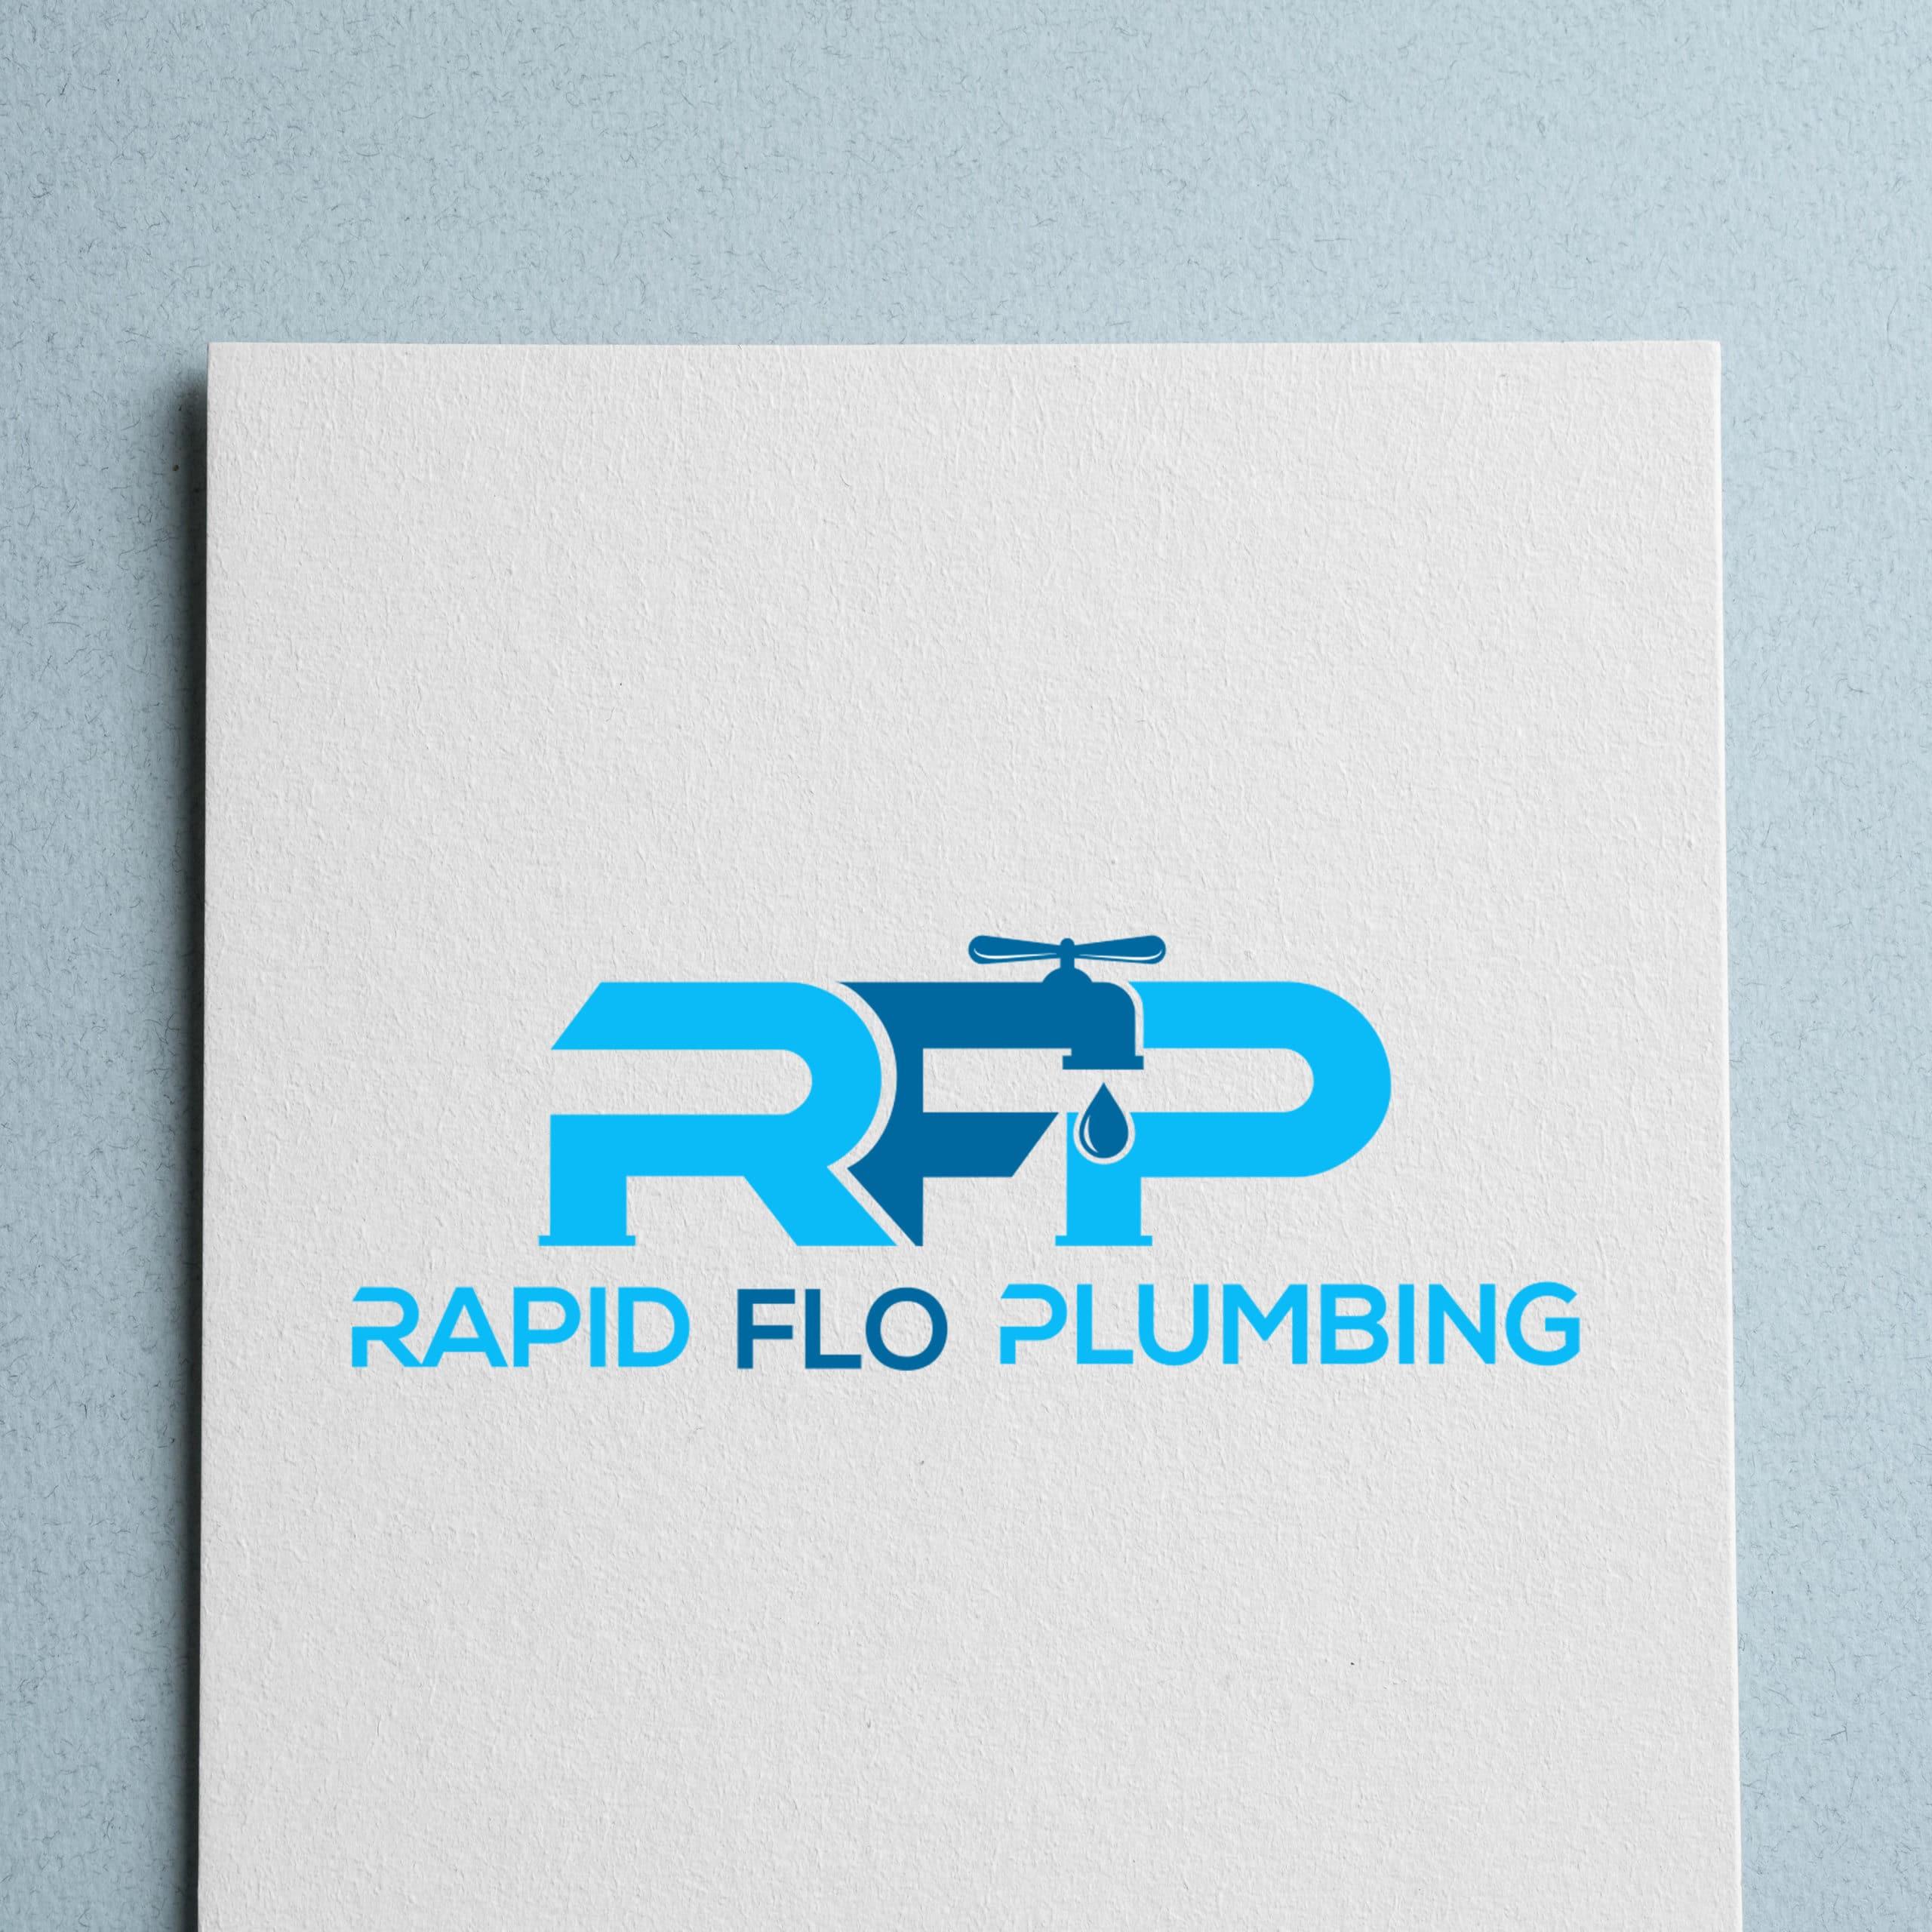 Rapid Flo Plumbing, Surrey